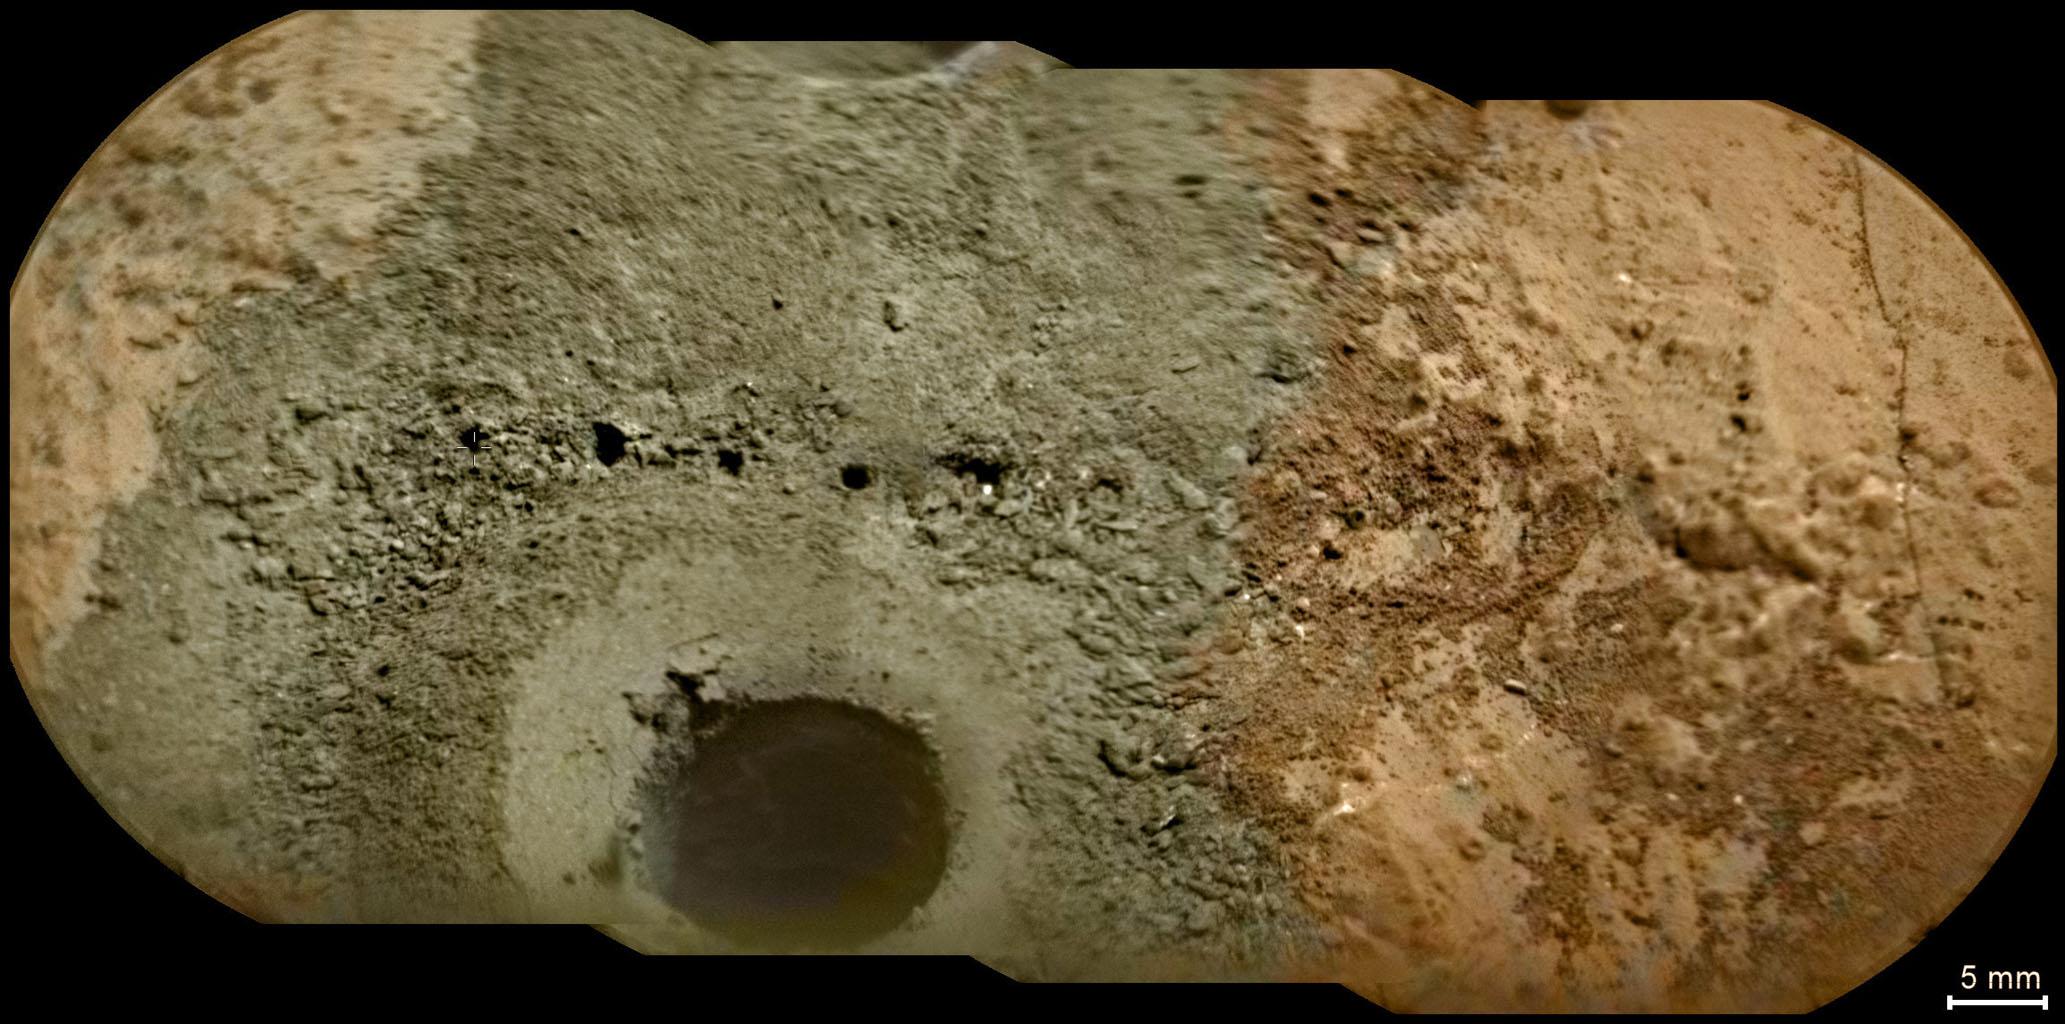 mars rover laser camera - photo #10